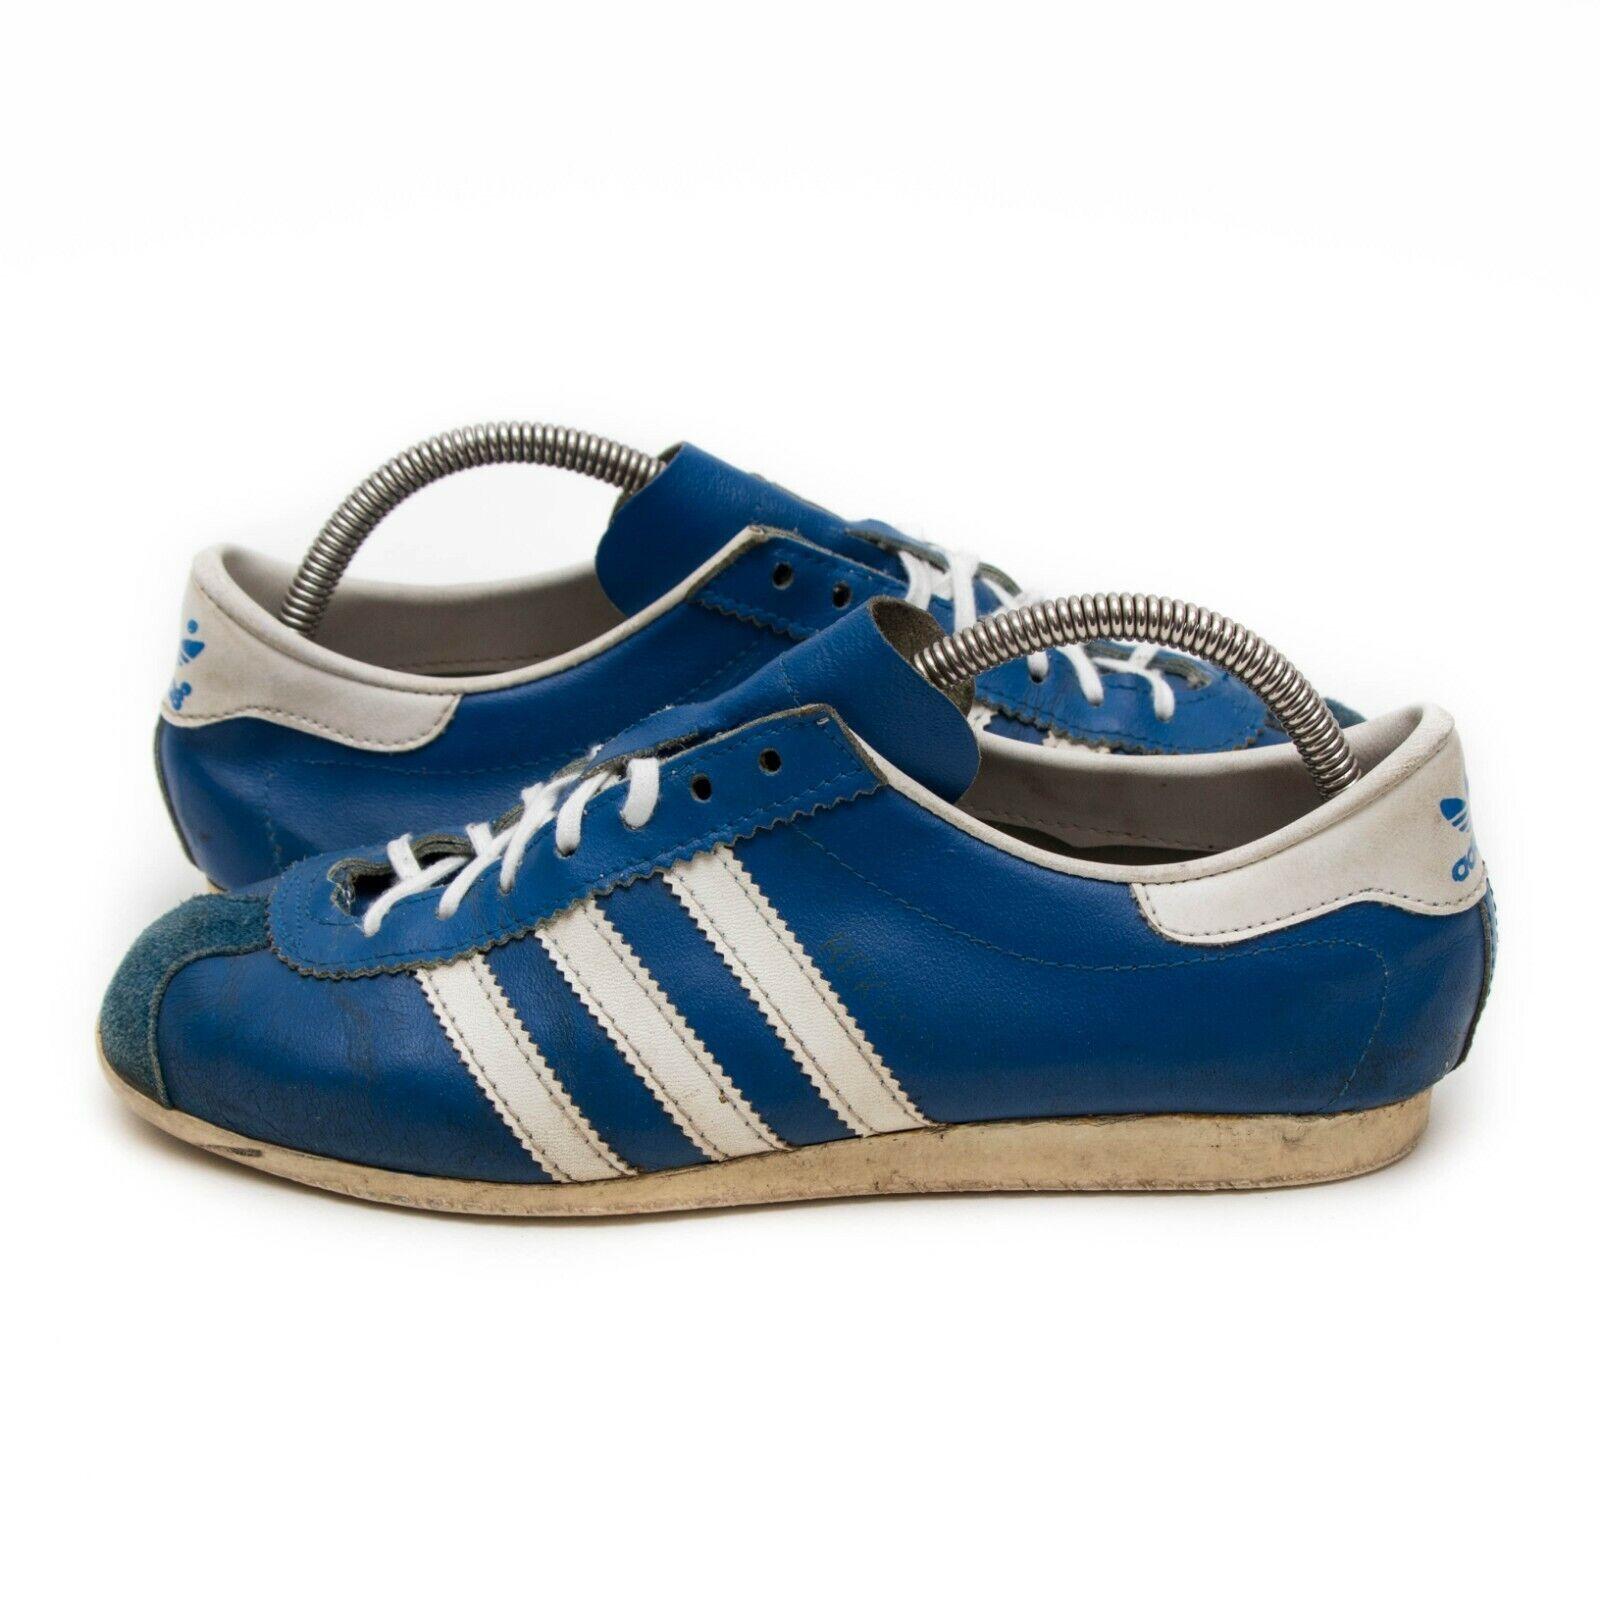 VINTAGE ADIDAS REKORD Schuhe Baby blau weiss